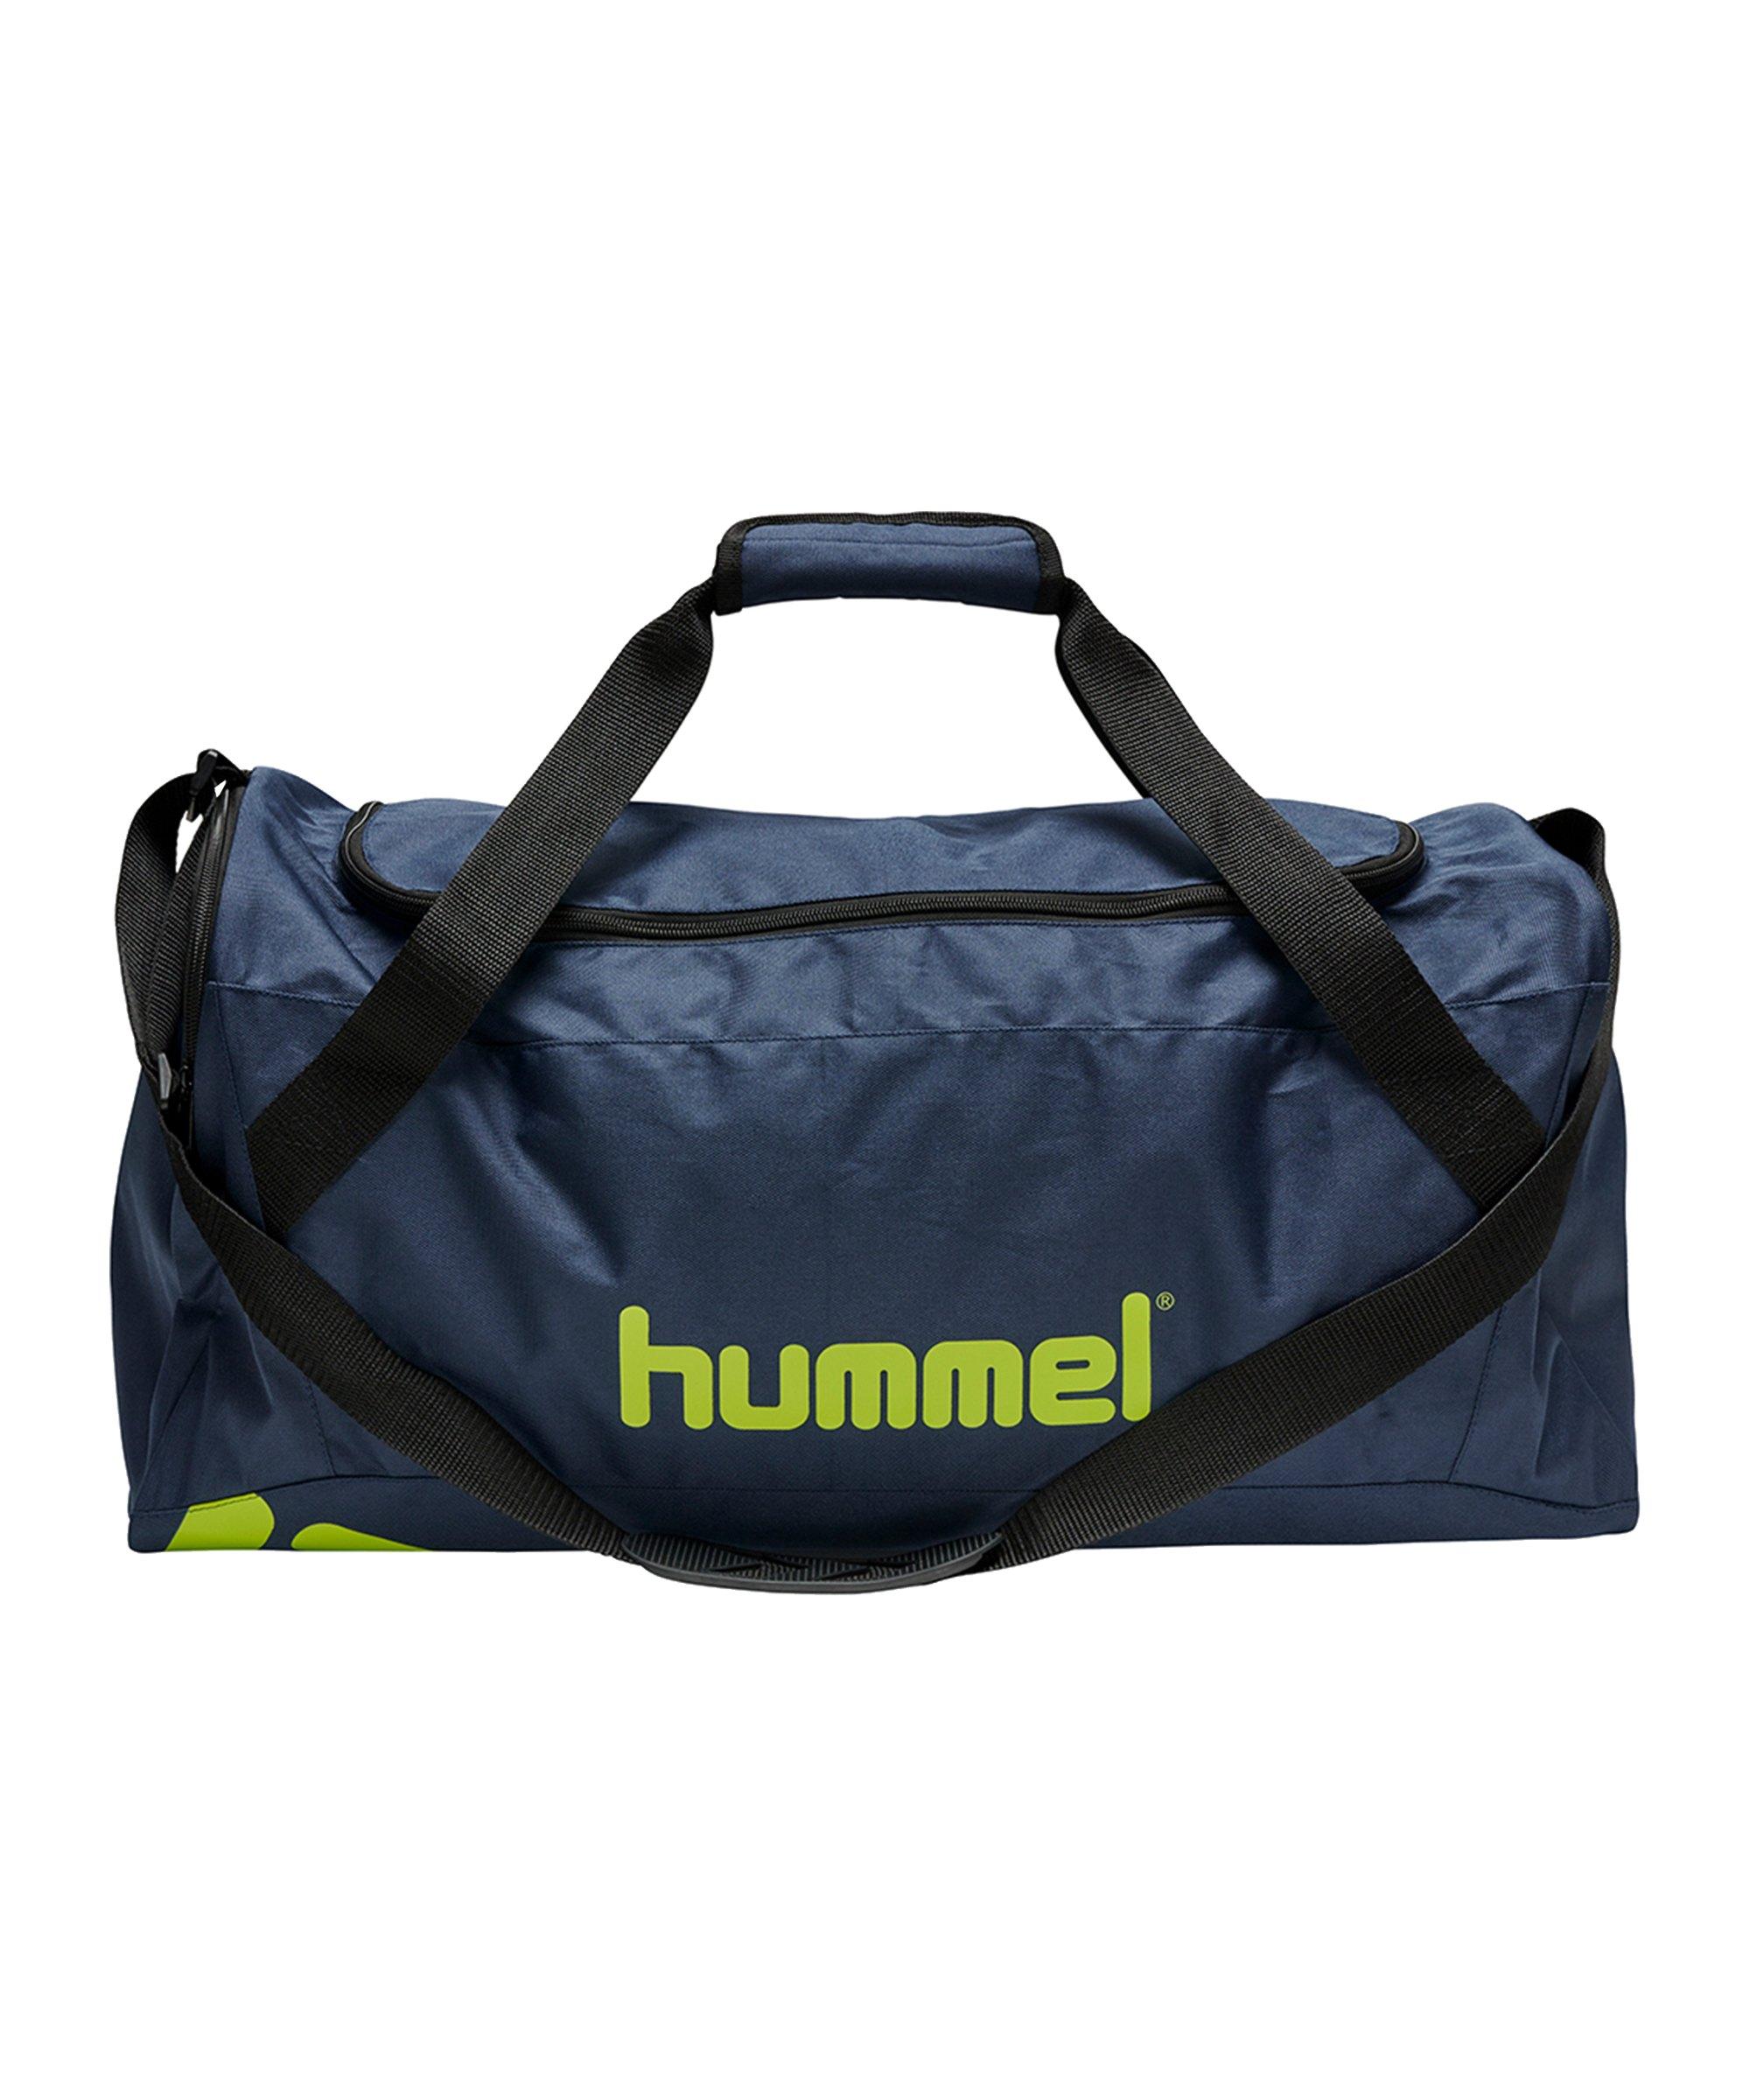 Hummel Core Bag Sporttasche Blau F6616 Gr. XS - blau